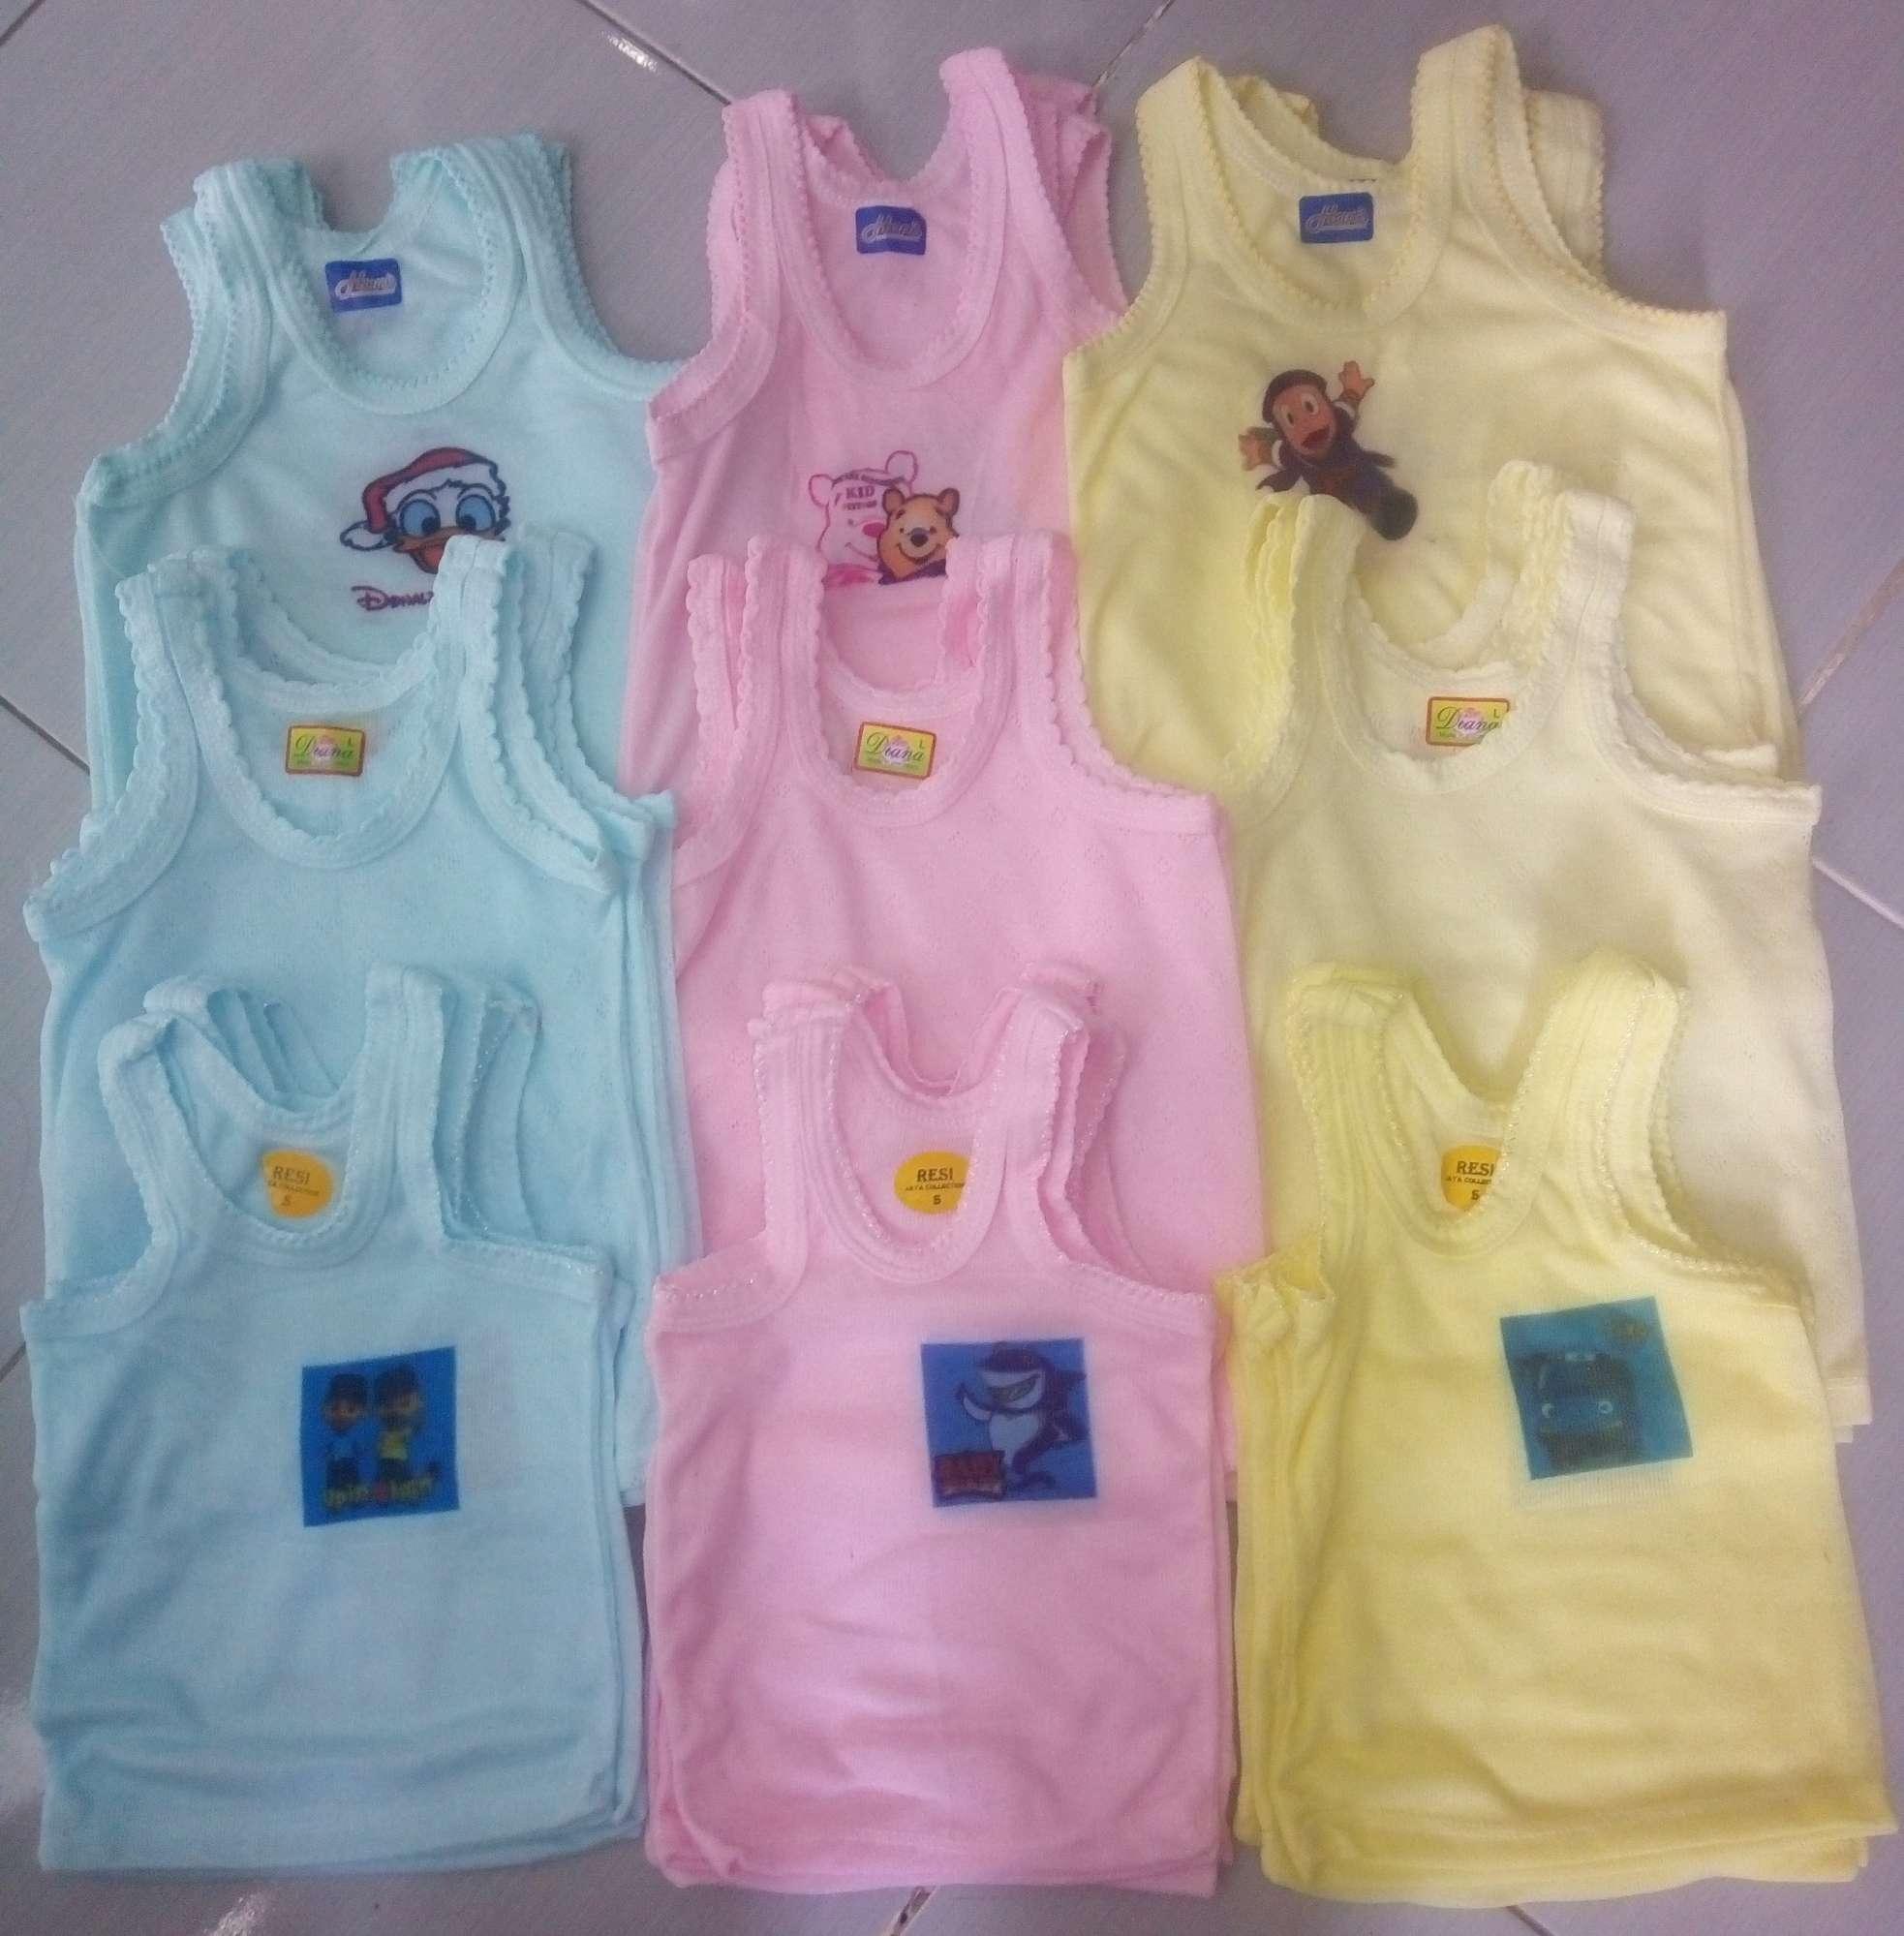 Baju Tidur Anak Perempuan Termurah  db6b8870ec